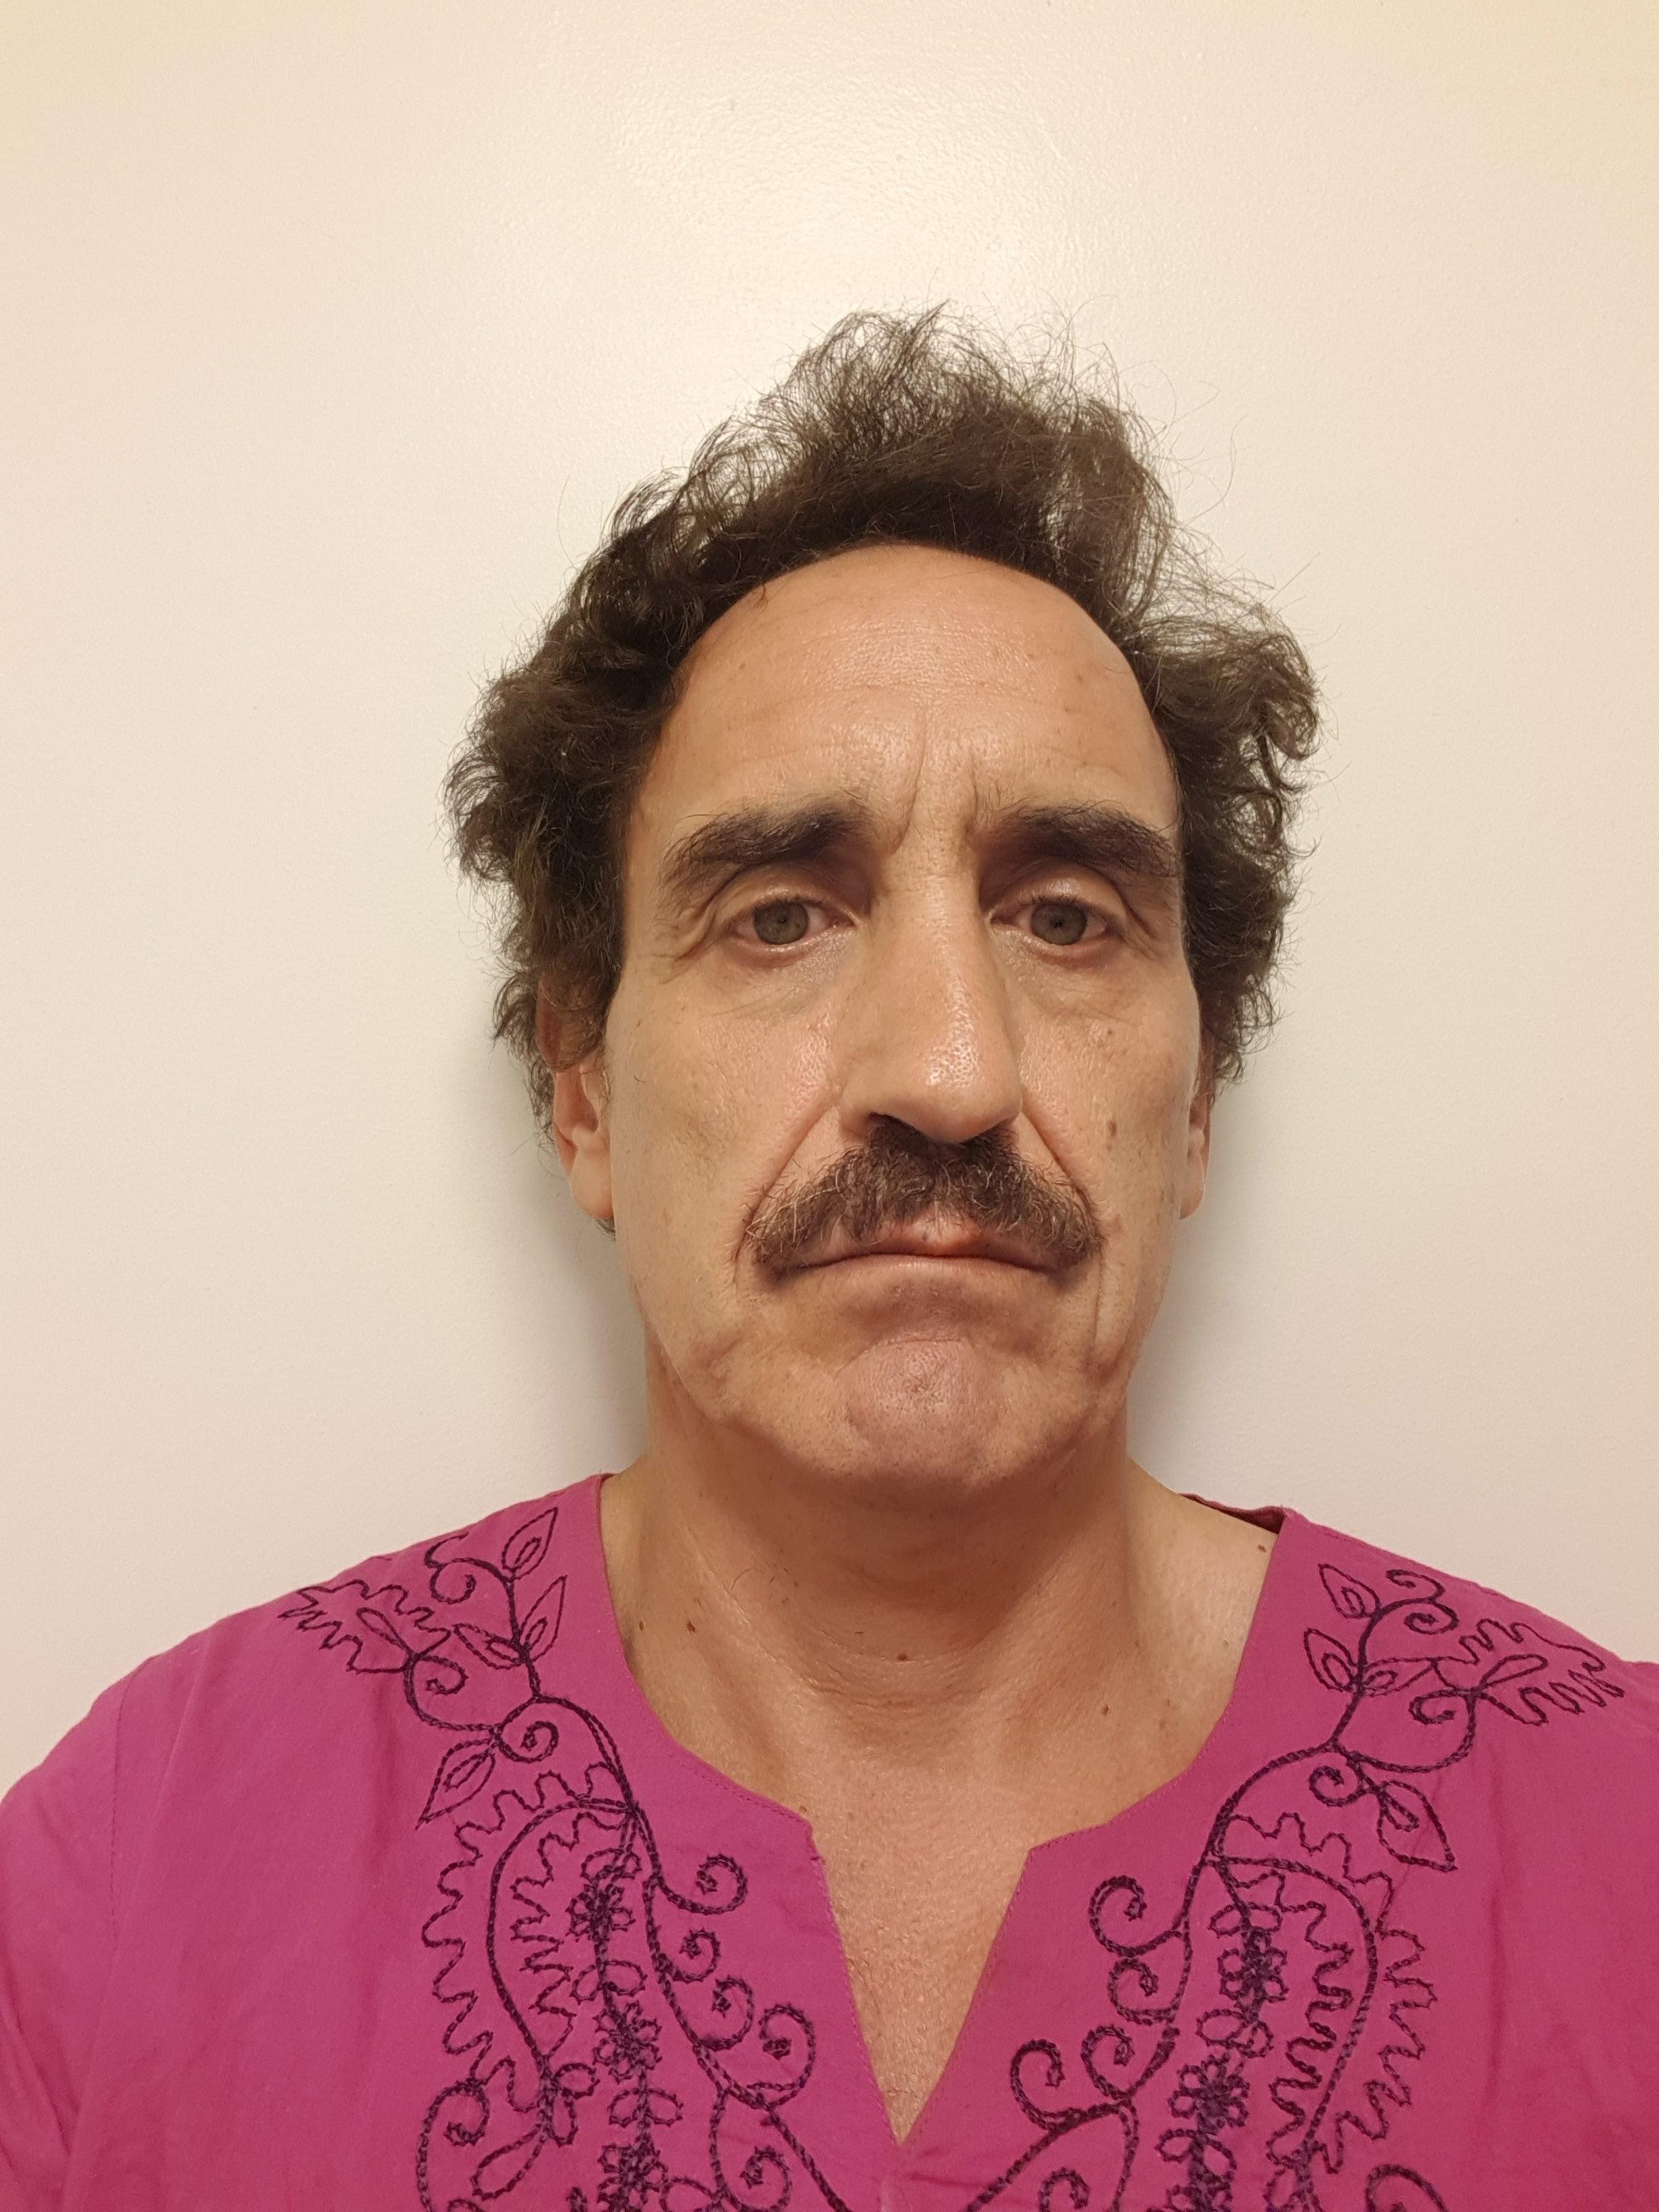 Jose' Lantacruz - Mexican drug lord